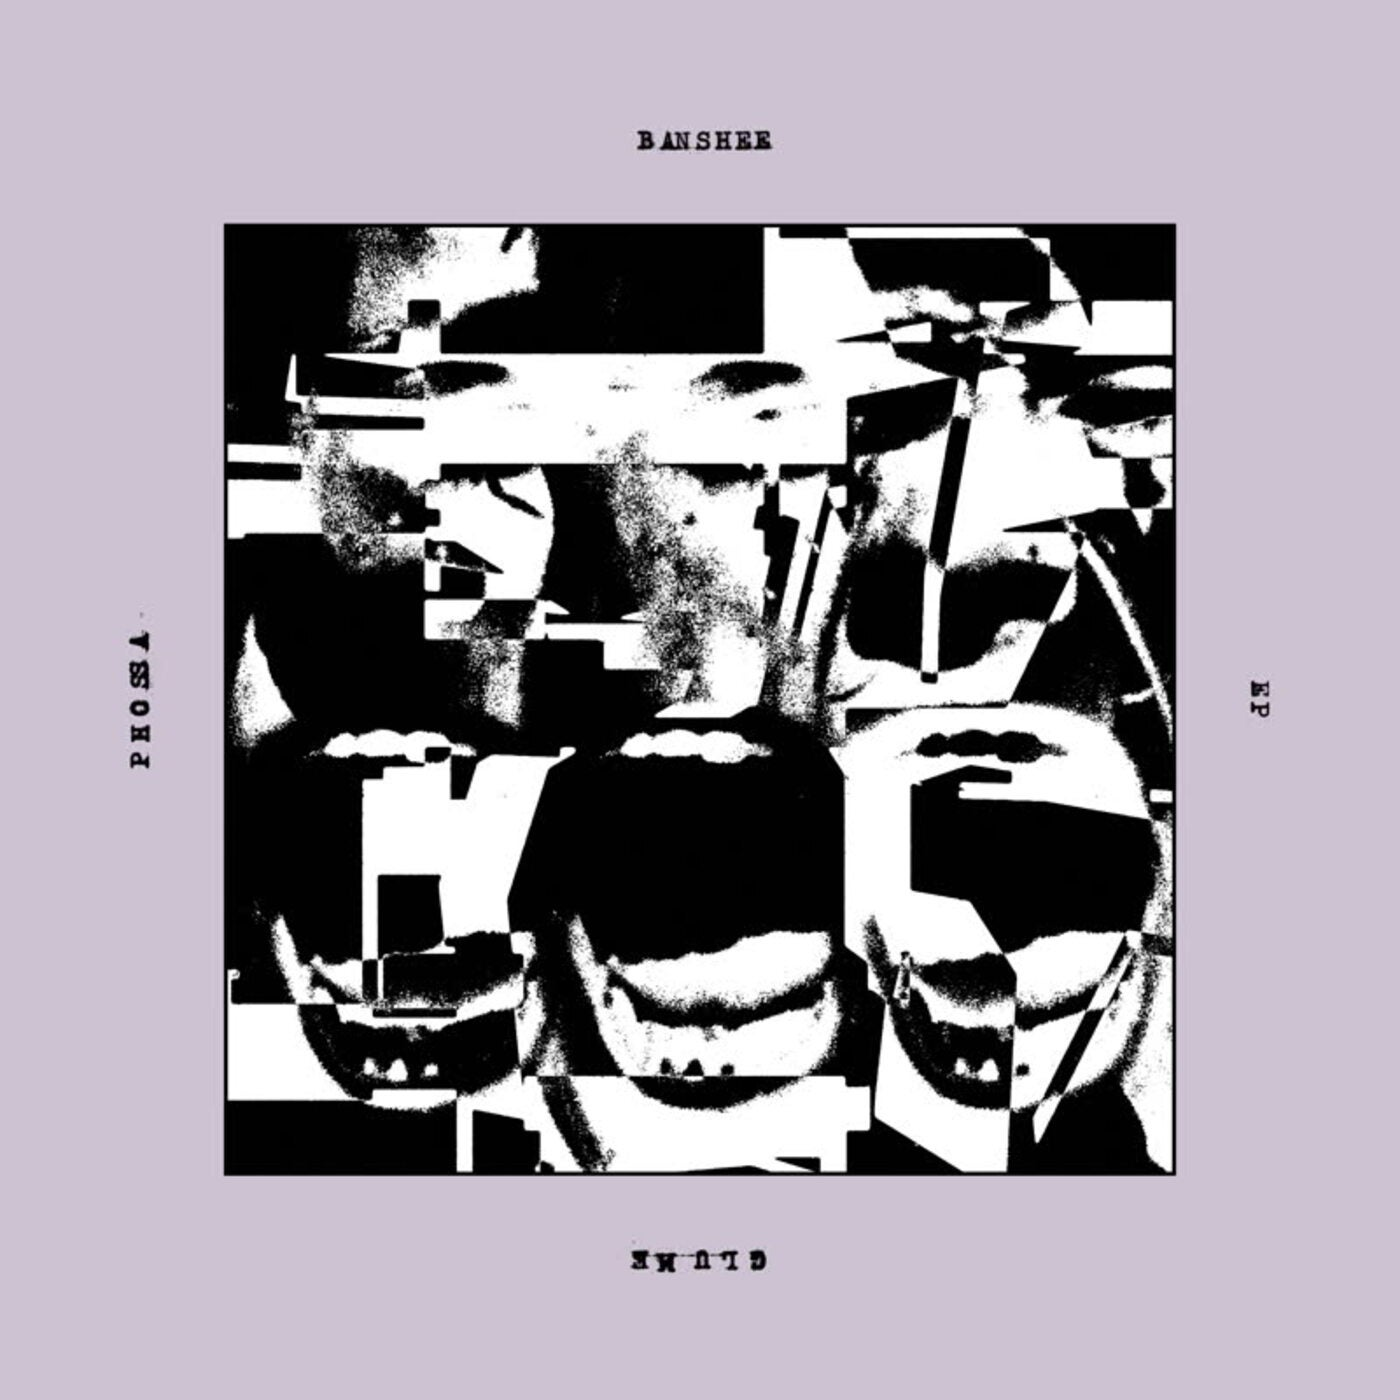 Banshee (Original Mix)